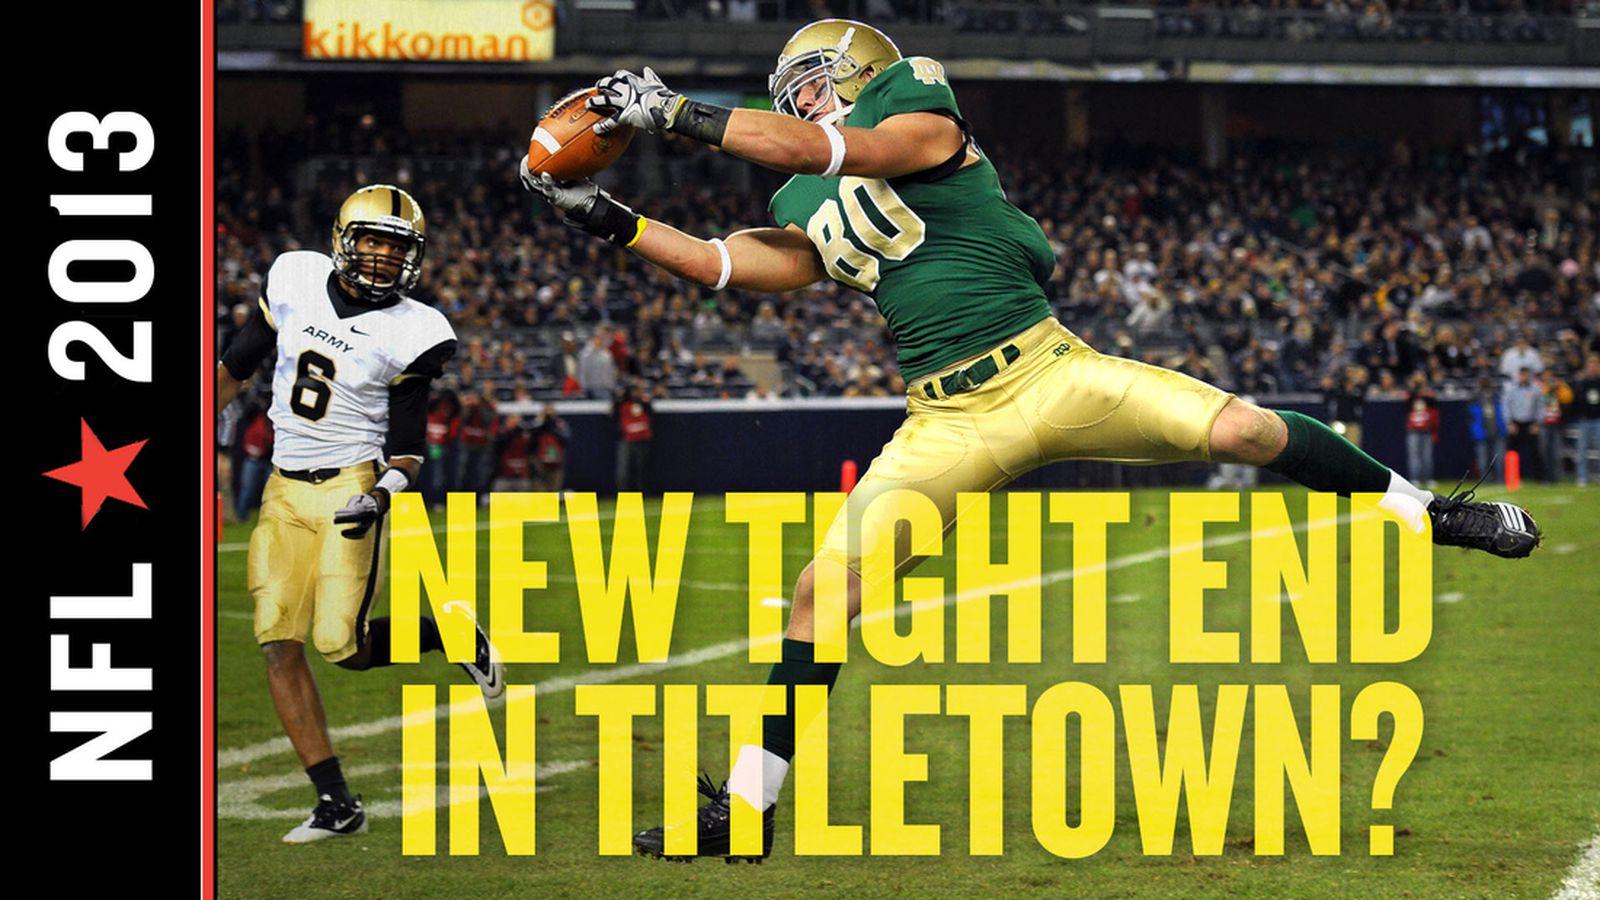 Packers 2013 NFL选秀:Green Bay可以看看Notre Dame TE Tyler Eifert